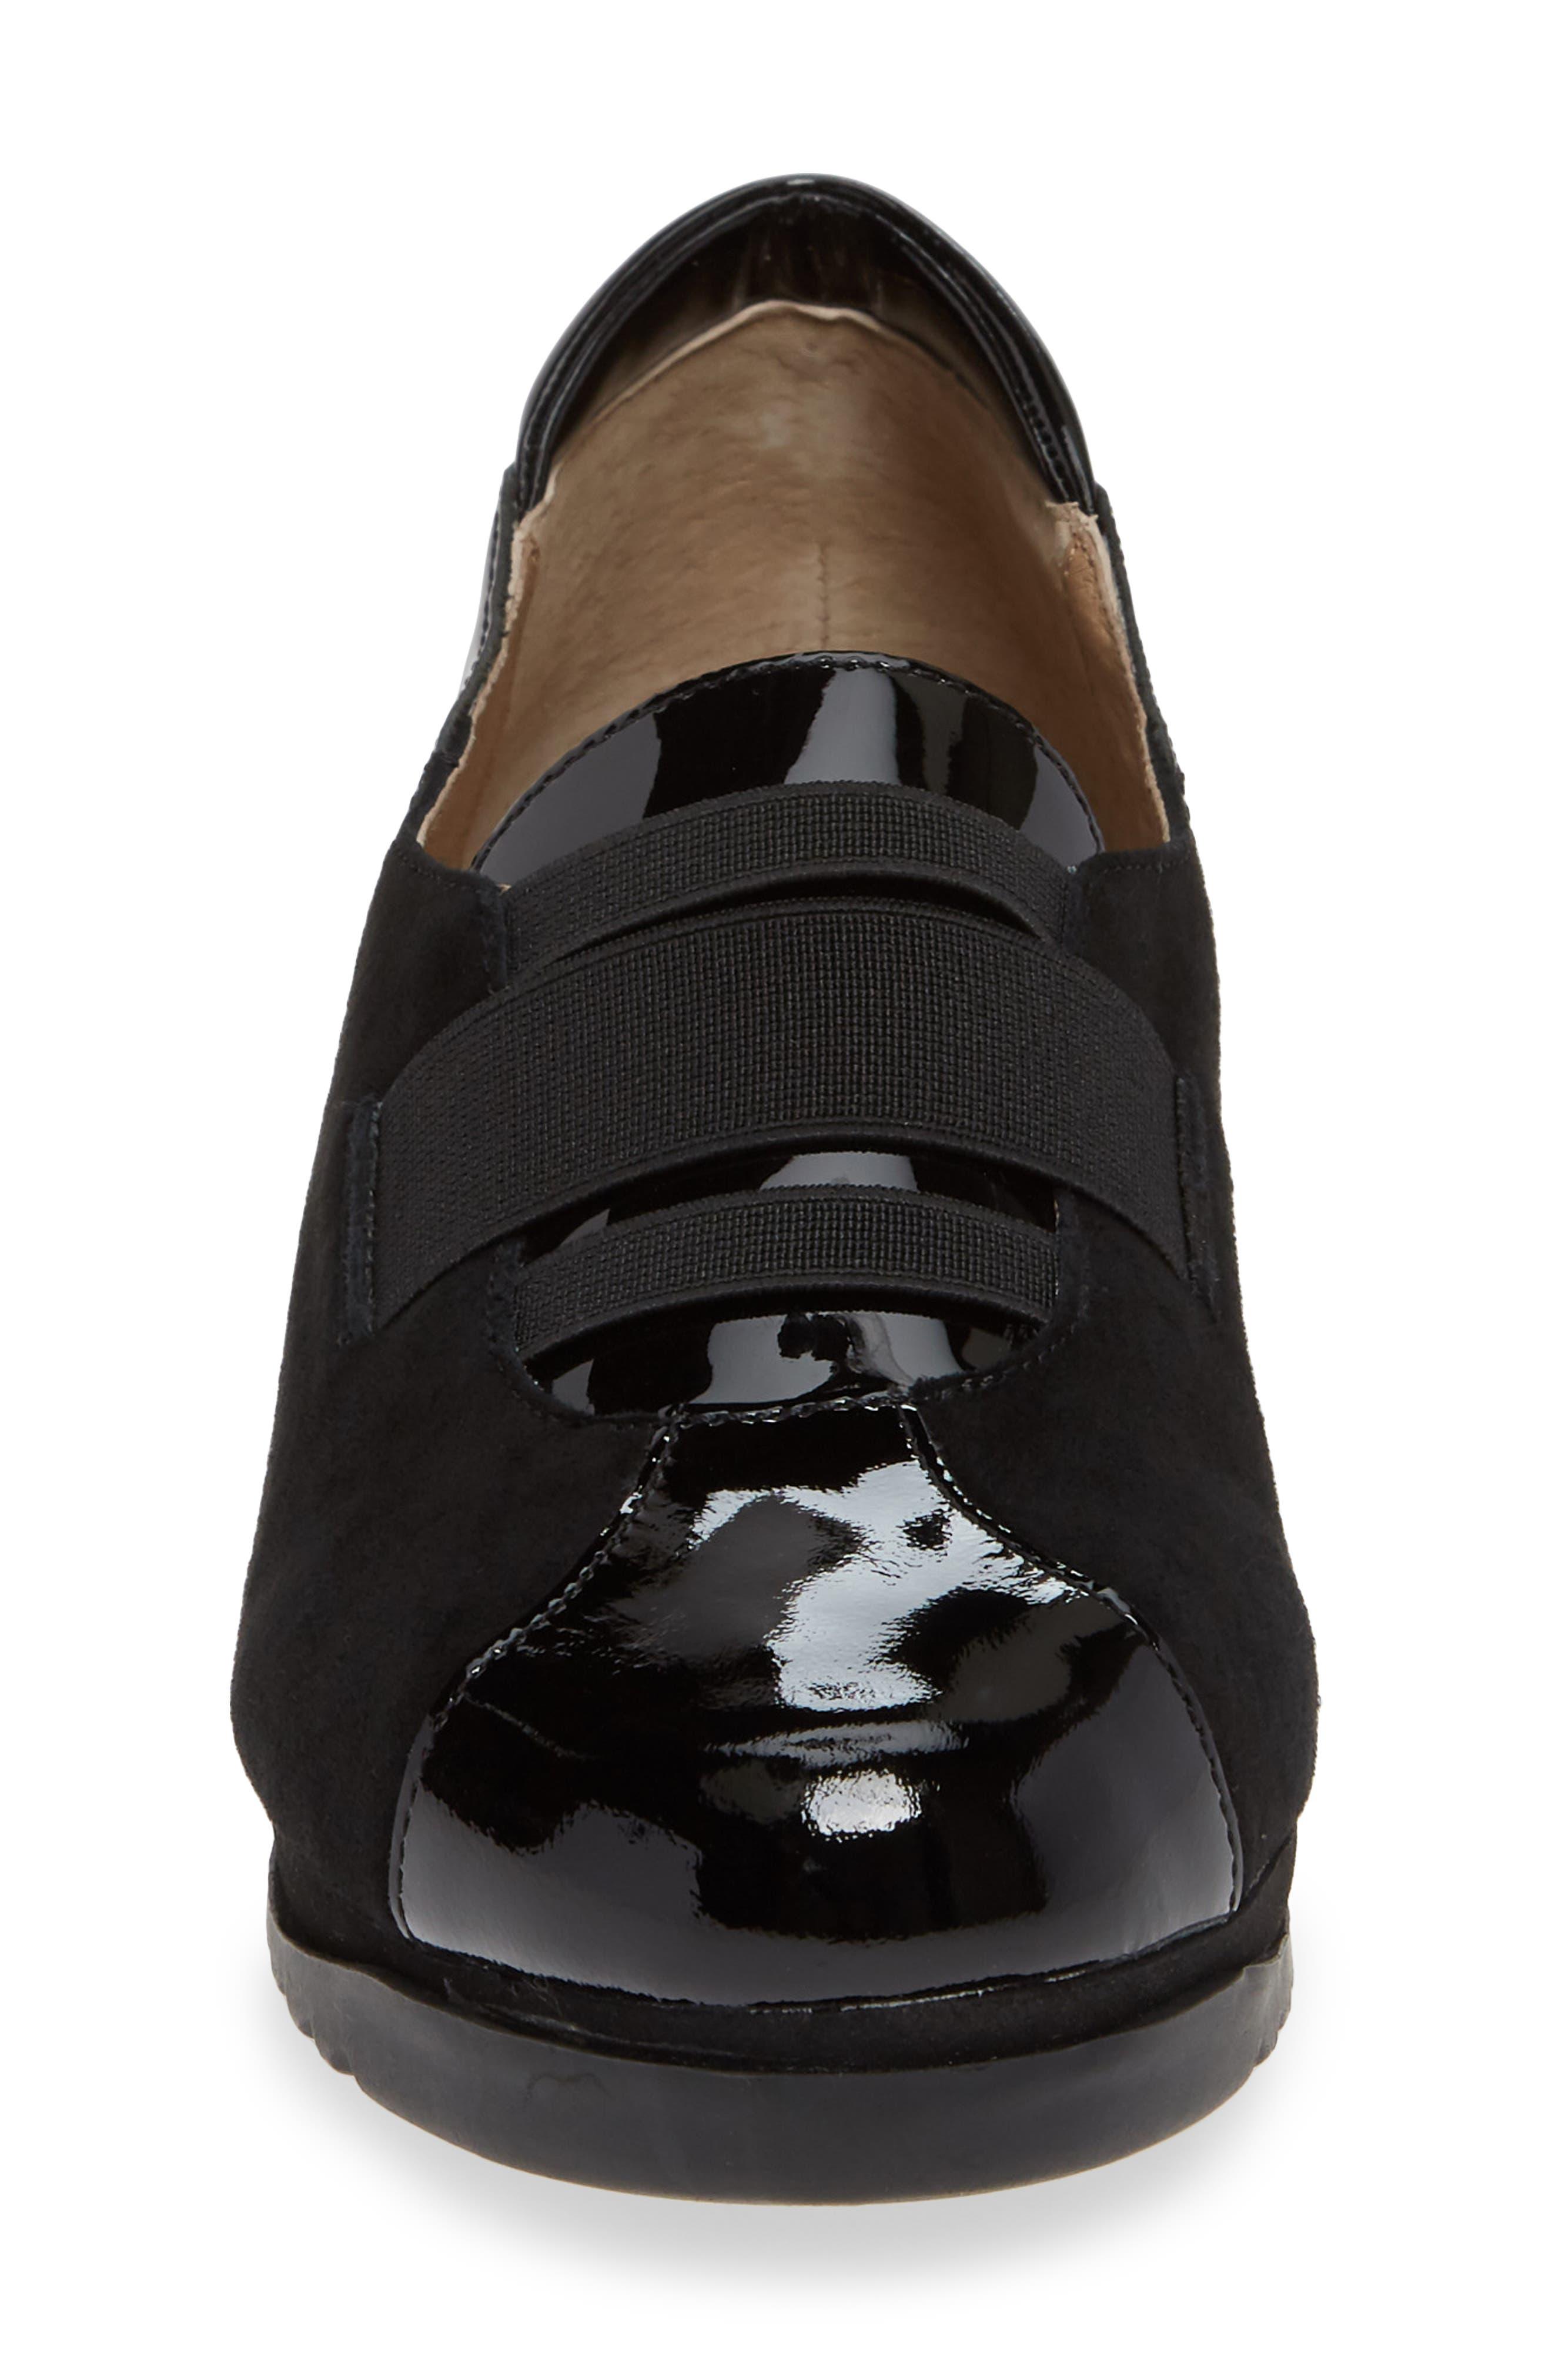 BETTYE MULLER CONCEPTS, Taytum Sneaker, Alternate thumbnail 4, color, BLACK SUEDE